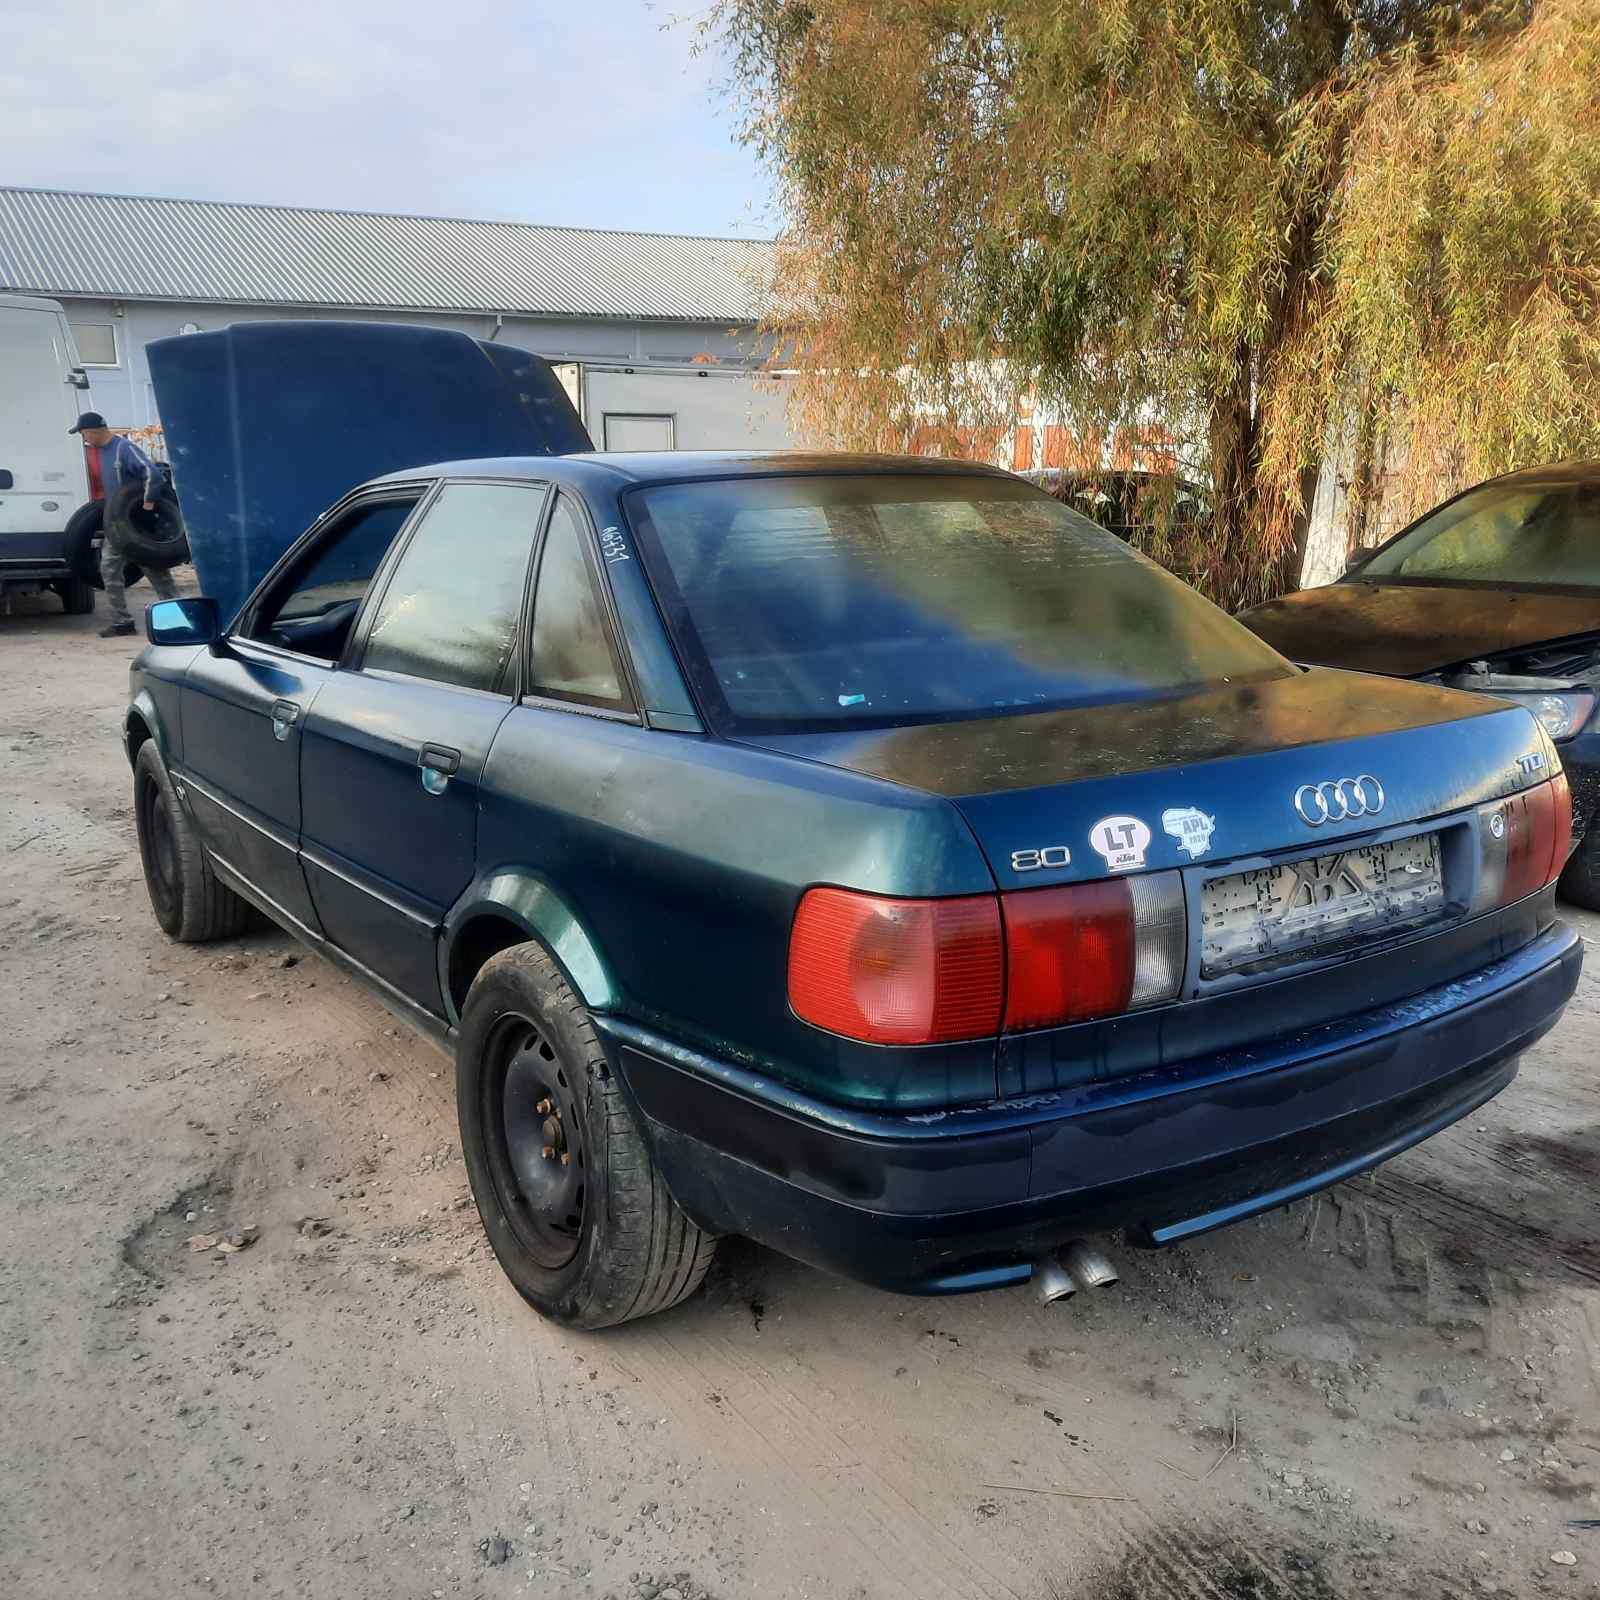 Used Car Parts Foto 4 Audi 80 1993 1.9 Mechanical Sedan 4/5 d. Green 2021-10-12 A6731